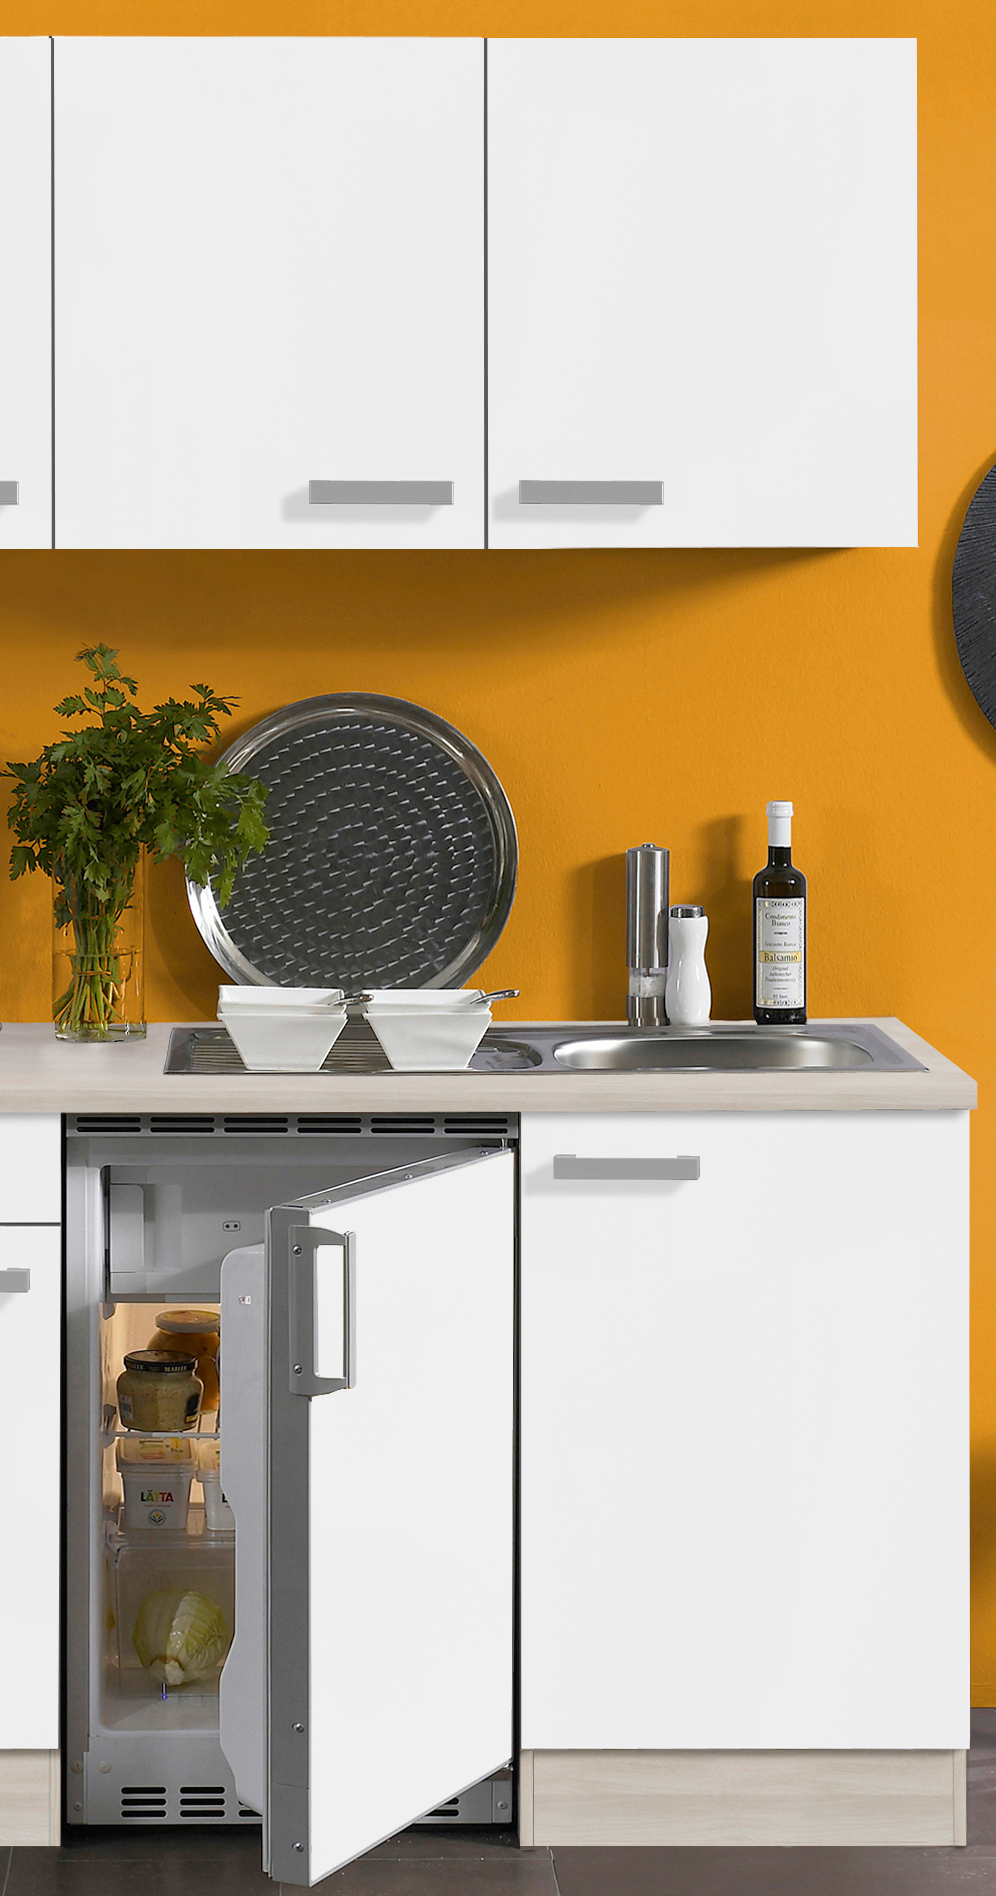 singlek che barcelona glaskeramik kochfeld 9 teilig breite 180 cm wei k che singlek chen. Black Bedroom Furniture Sets. Home Design Ideas